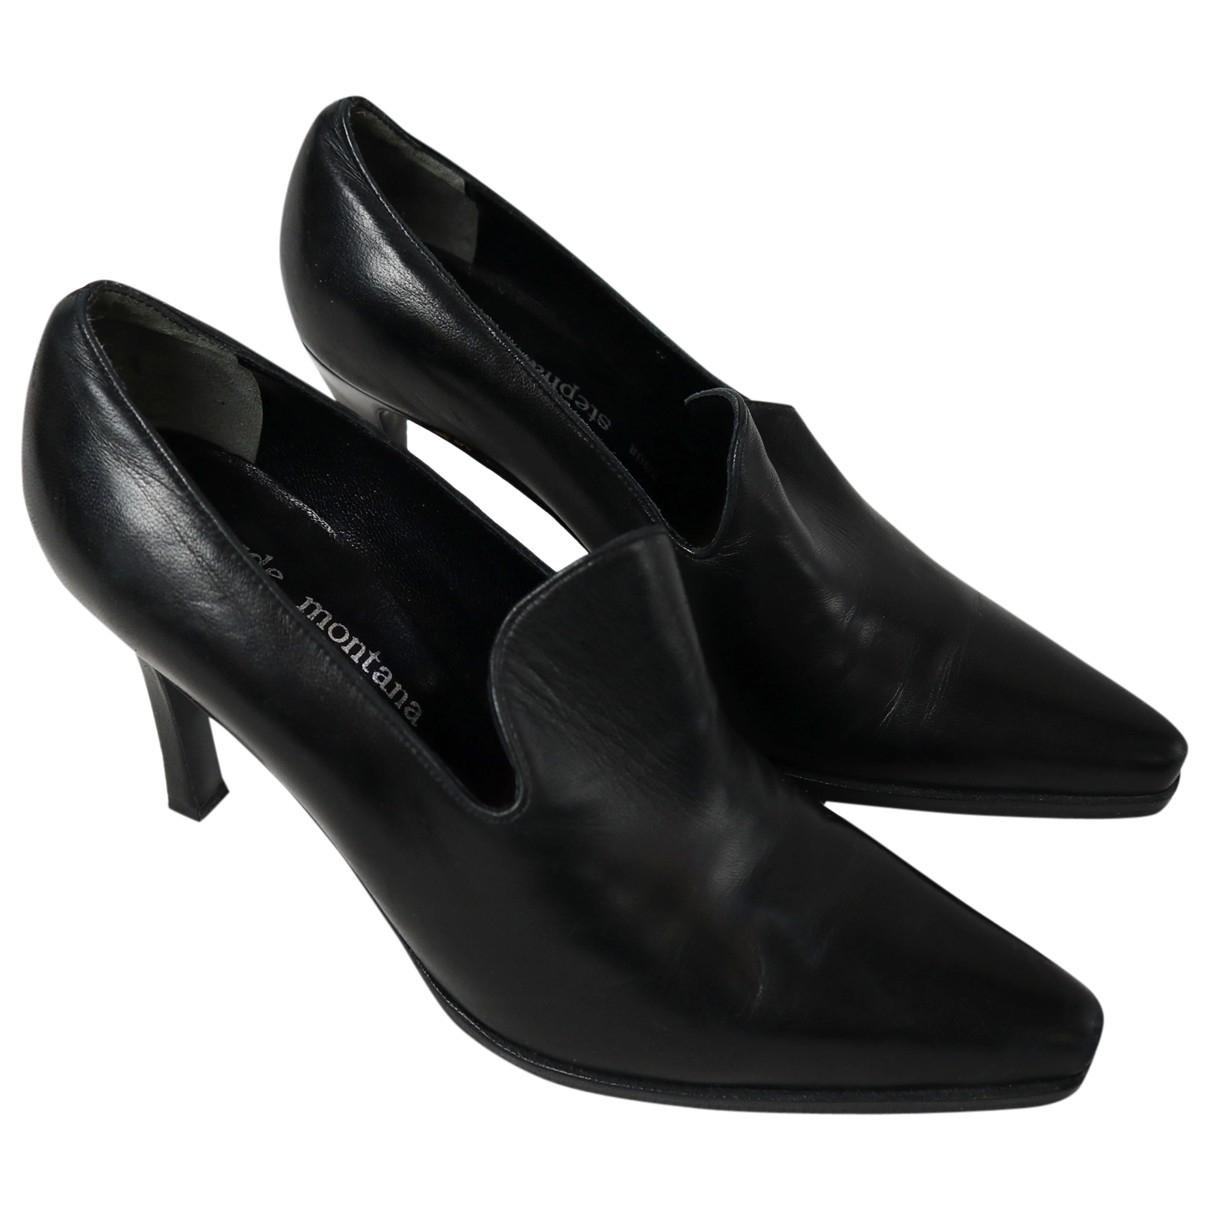 Claude Montana \N Black Leather Heels for Women 5.5 UK